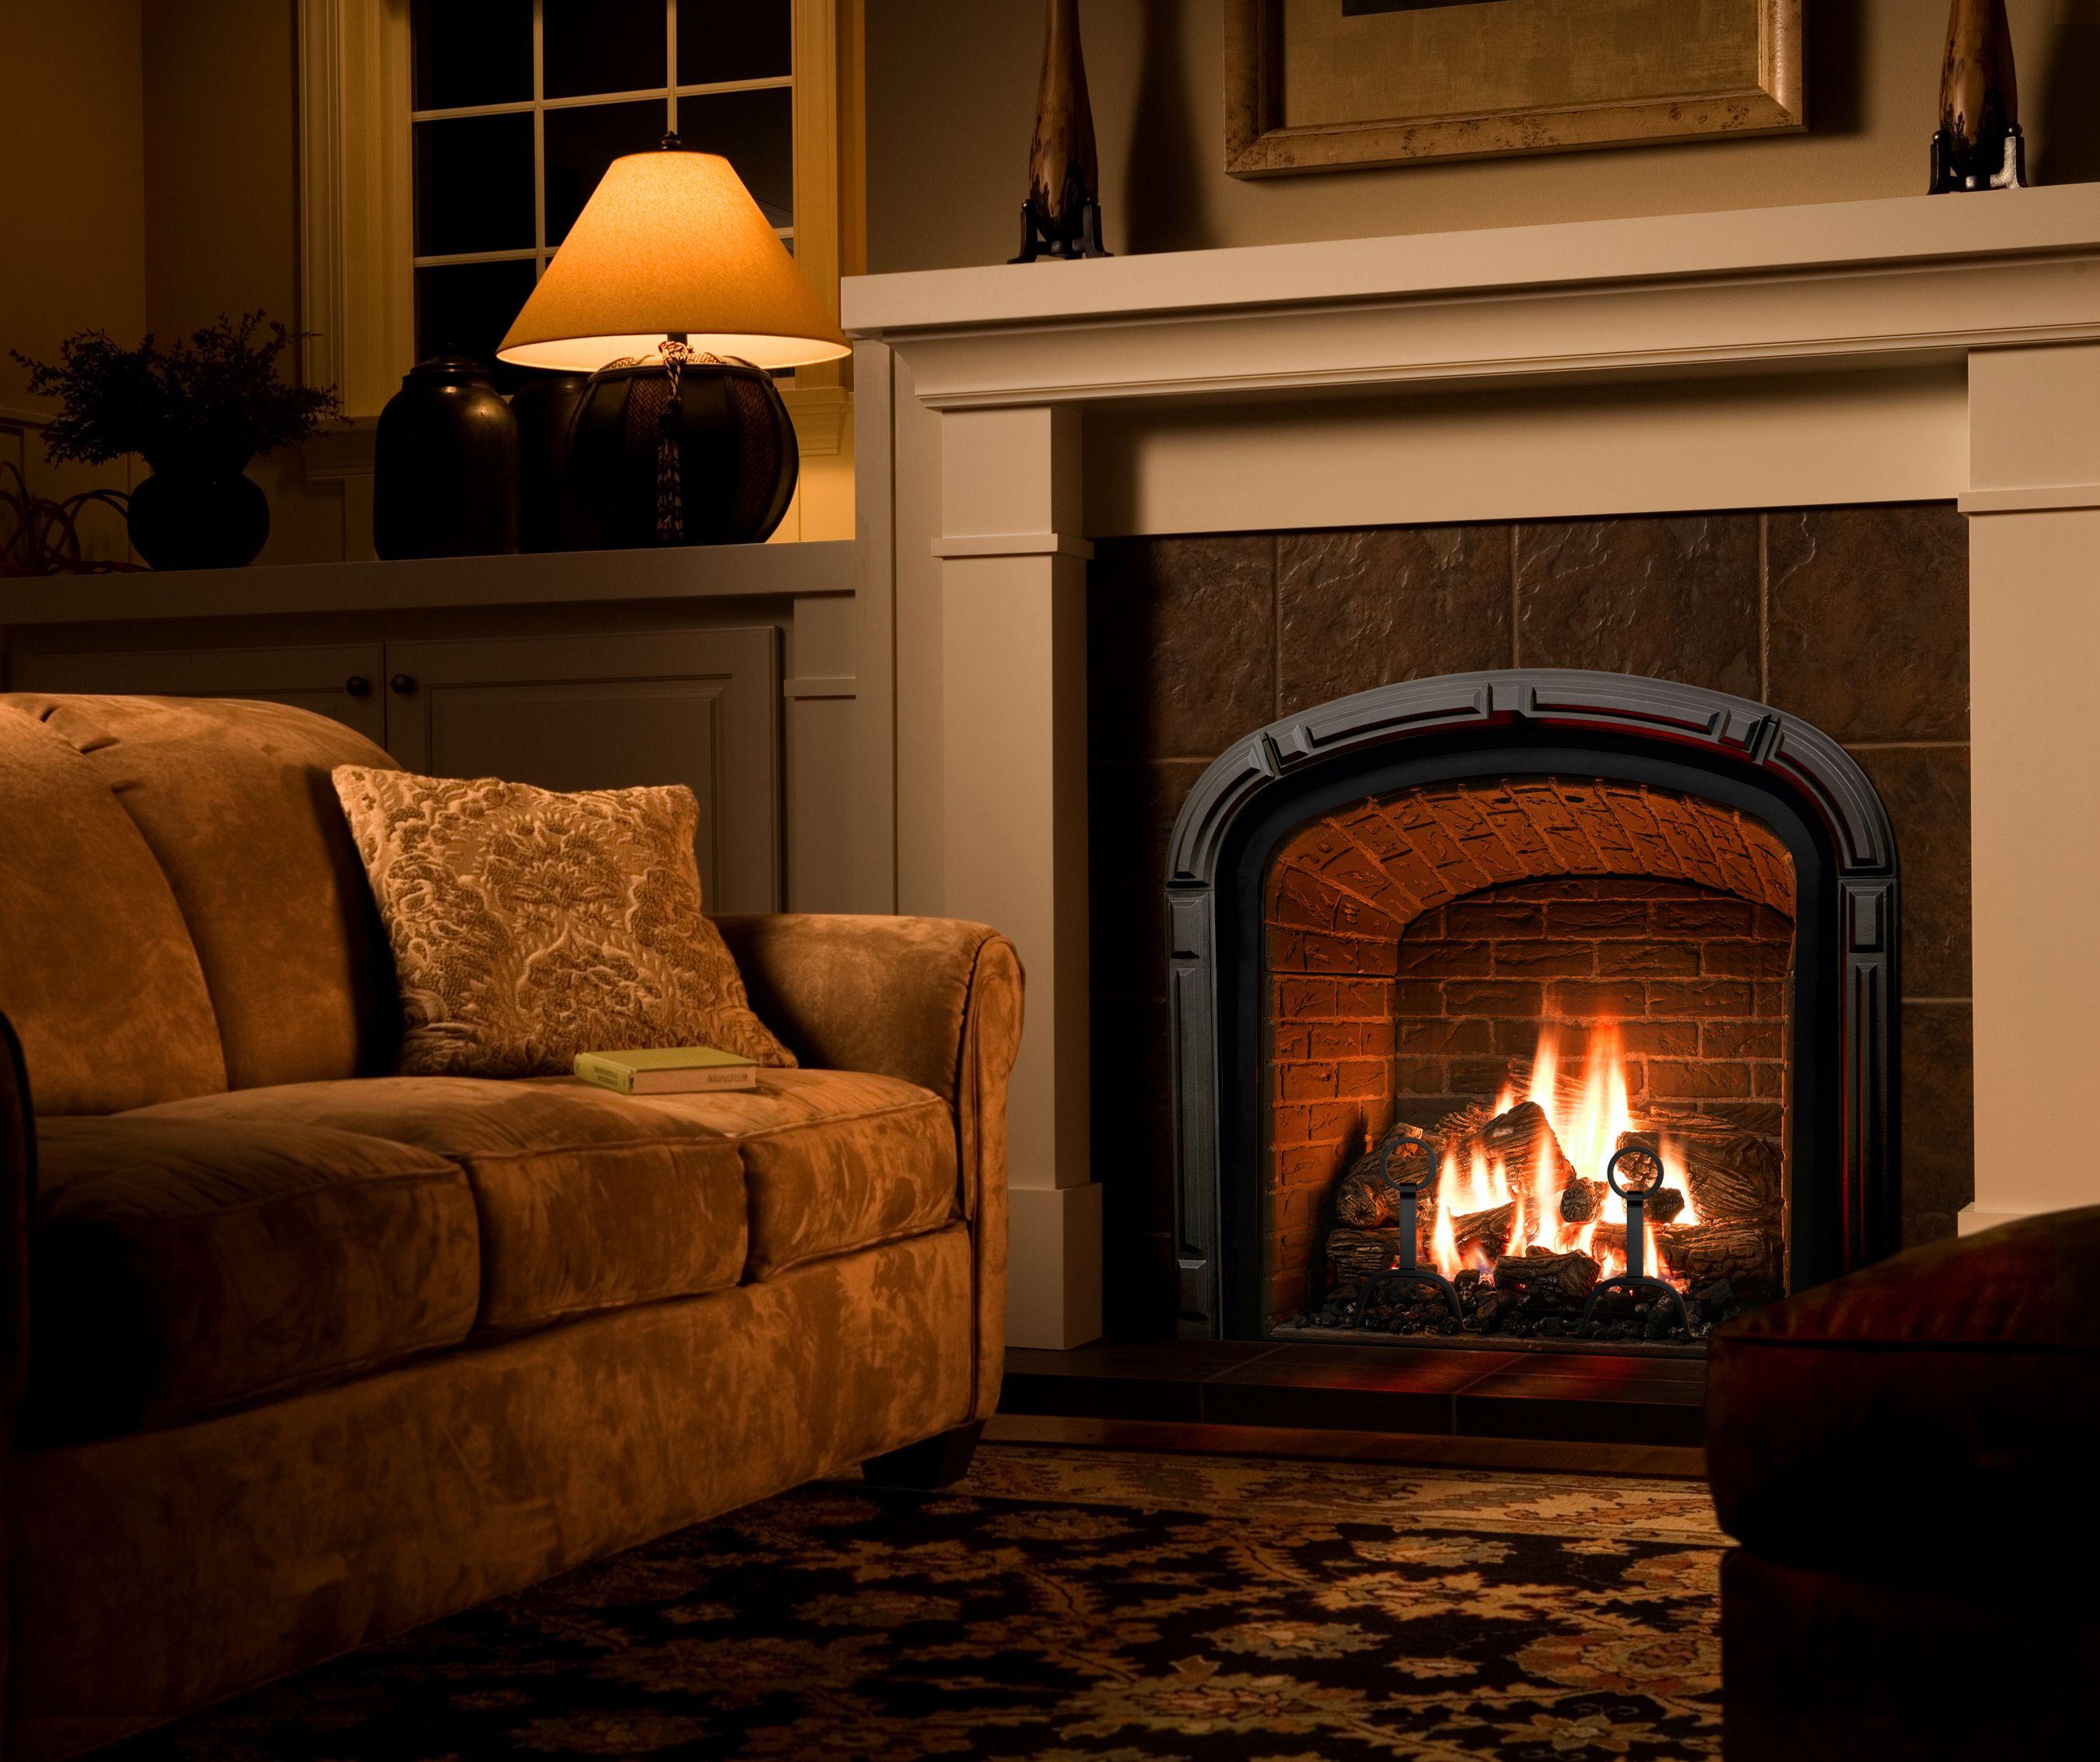 mendota gas fireplaces home decor ideas pinterest